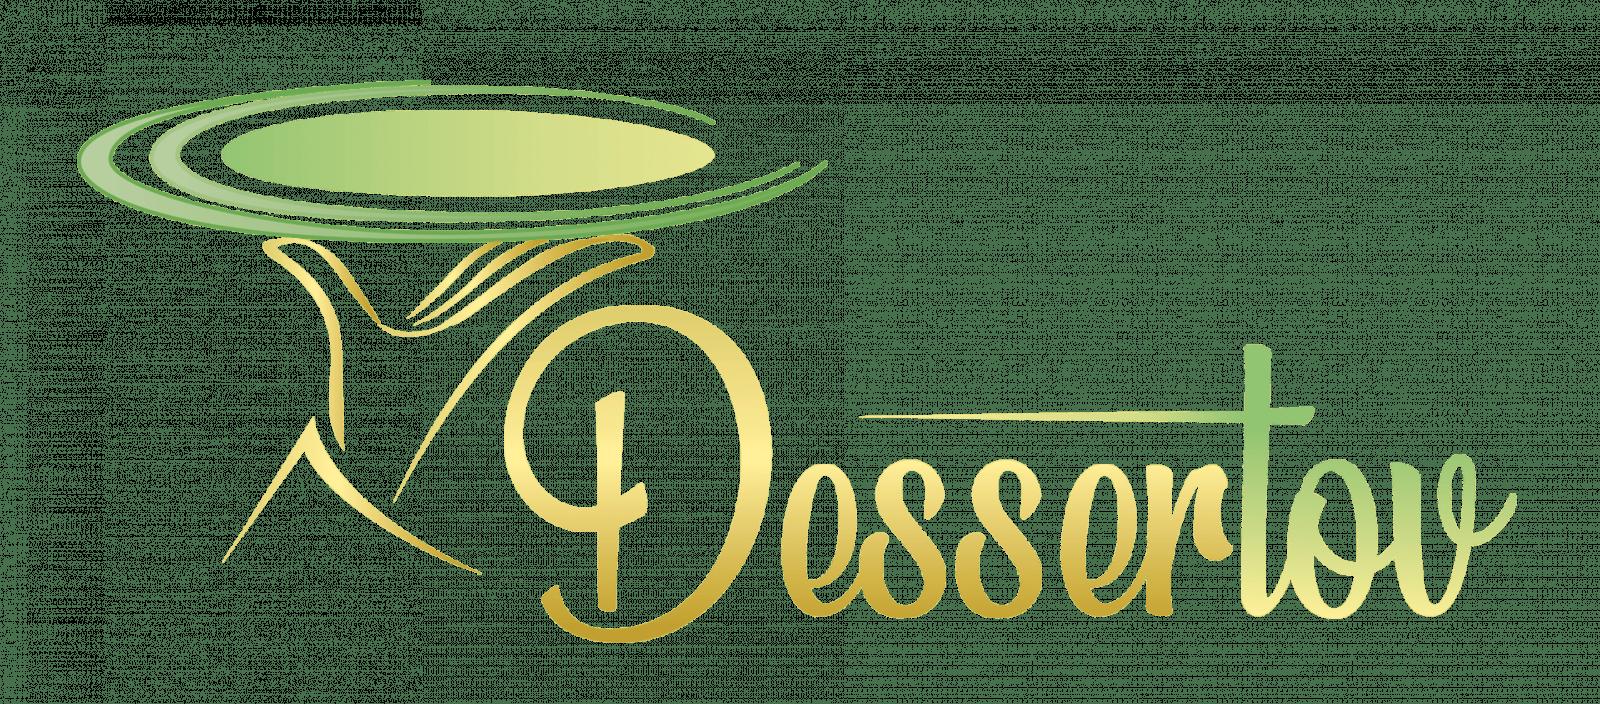 Dessertov-Final-work-for-mail-signature-format